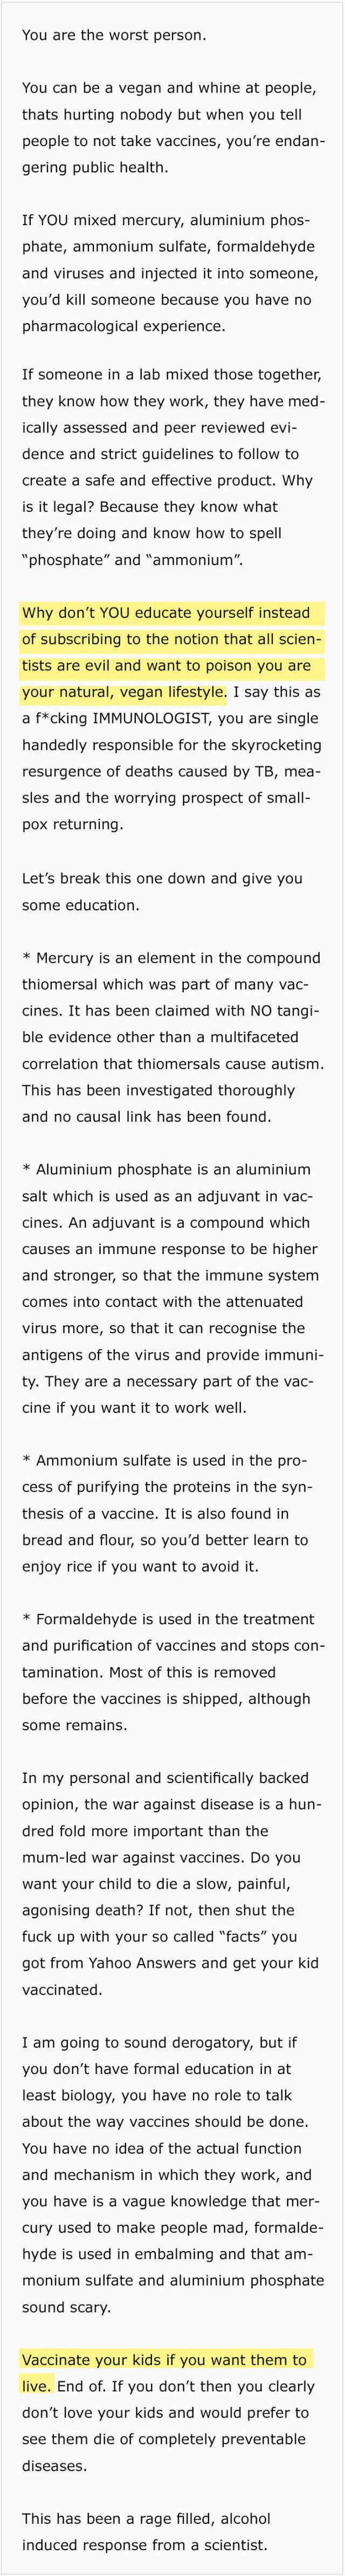 Immunologist Shuts Down An Avid Anti-Vaxxer (2 pics)